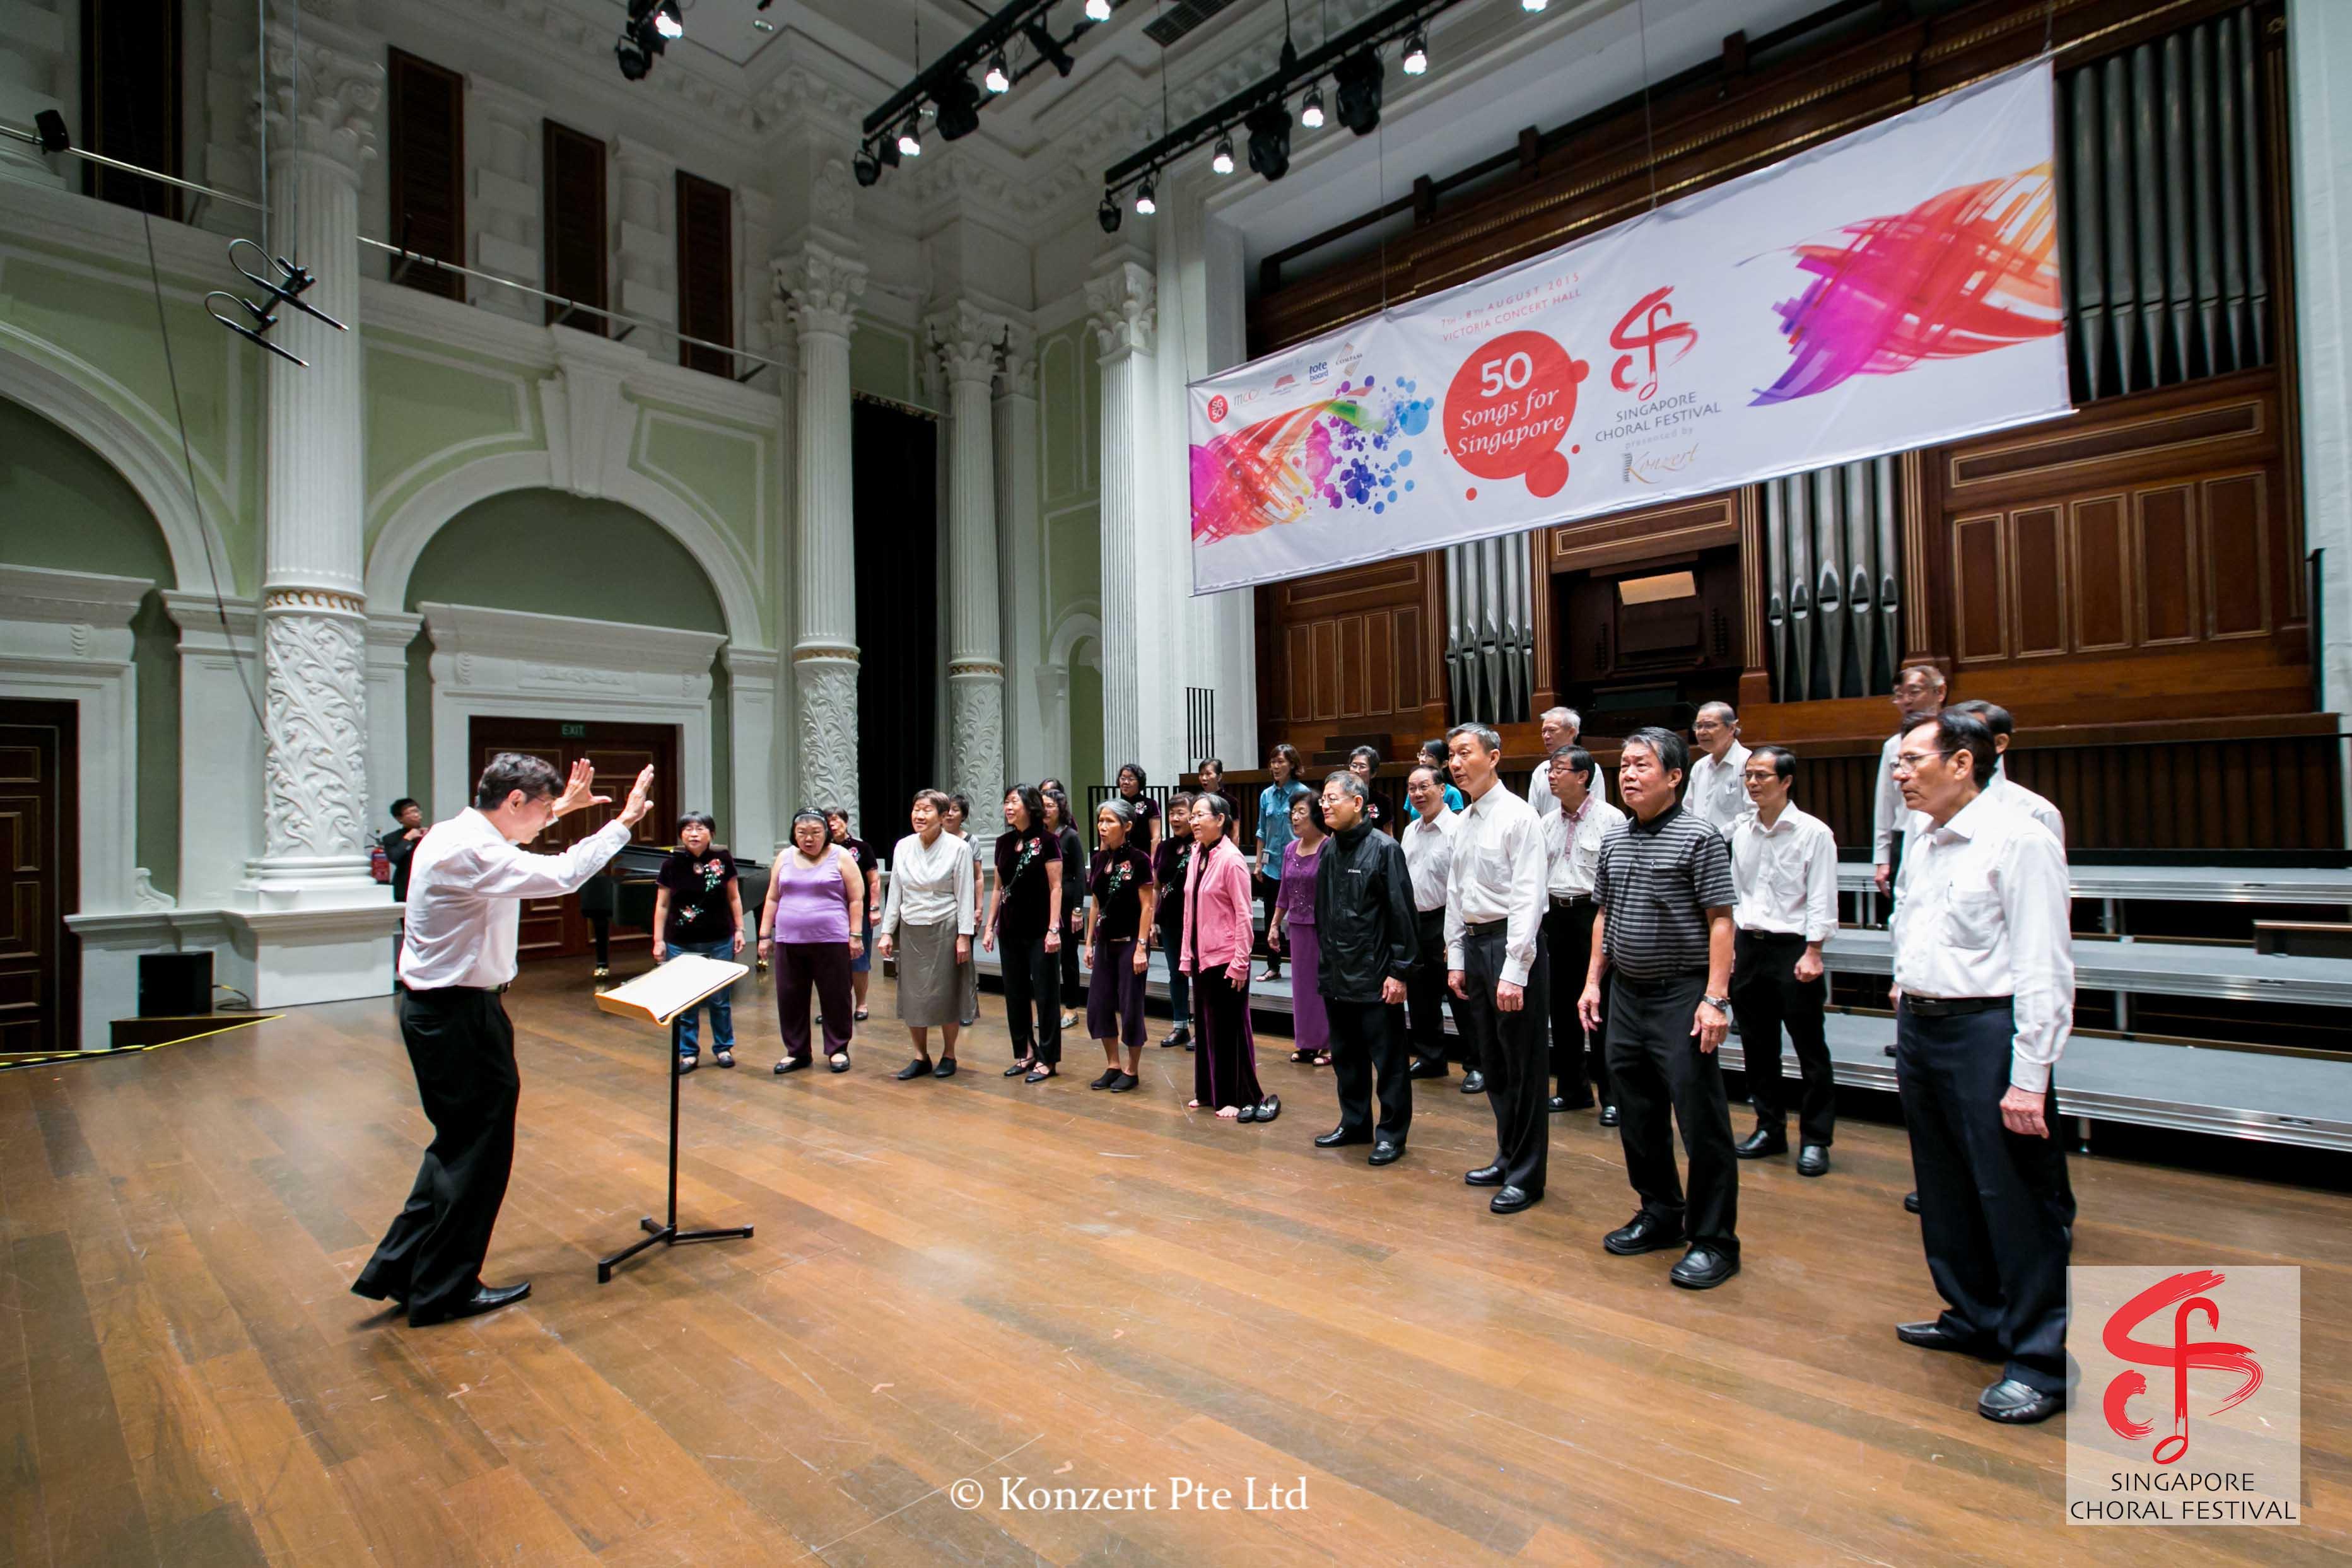 Singapore Choral Festival 8-8-15 (44).jpg